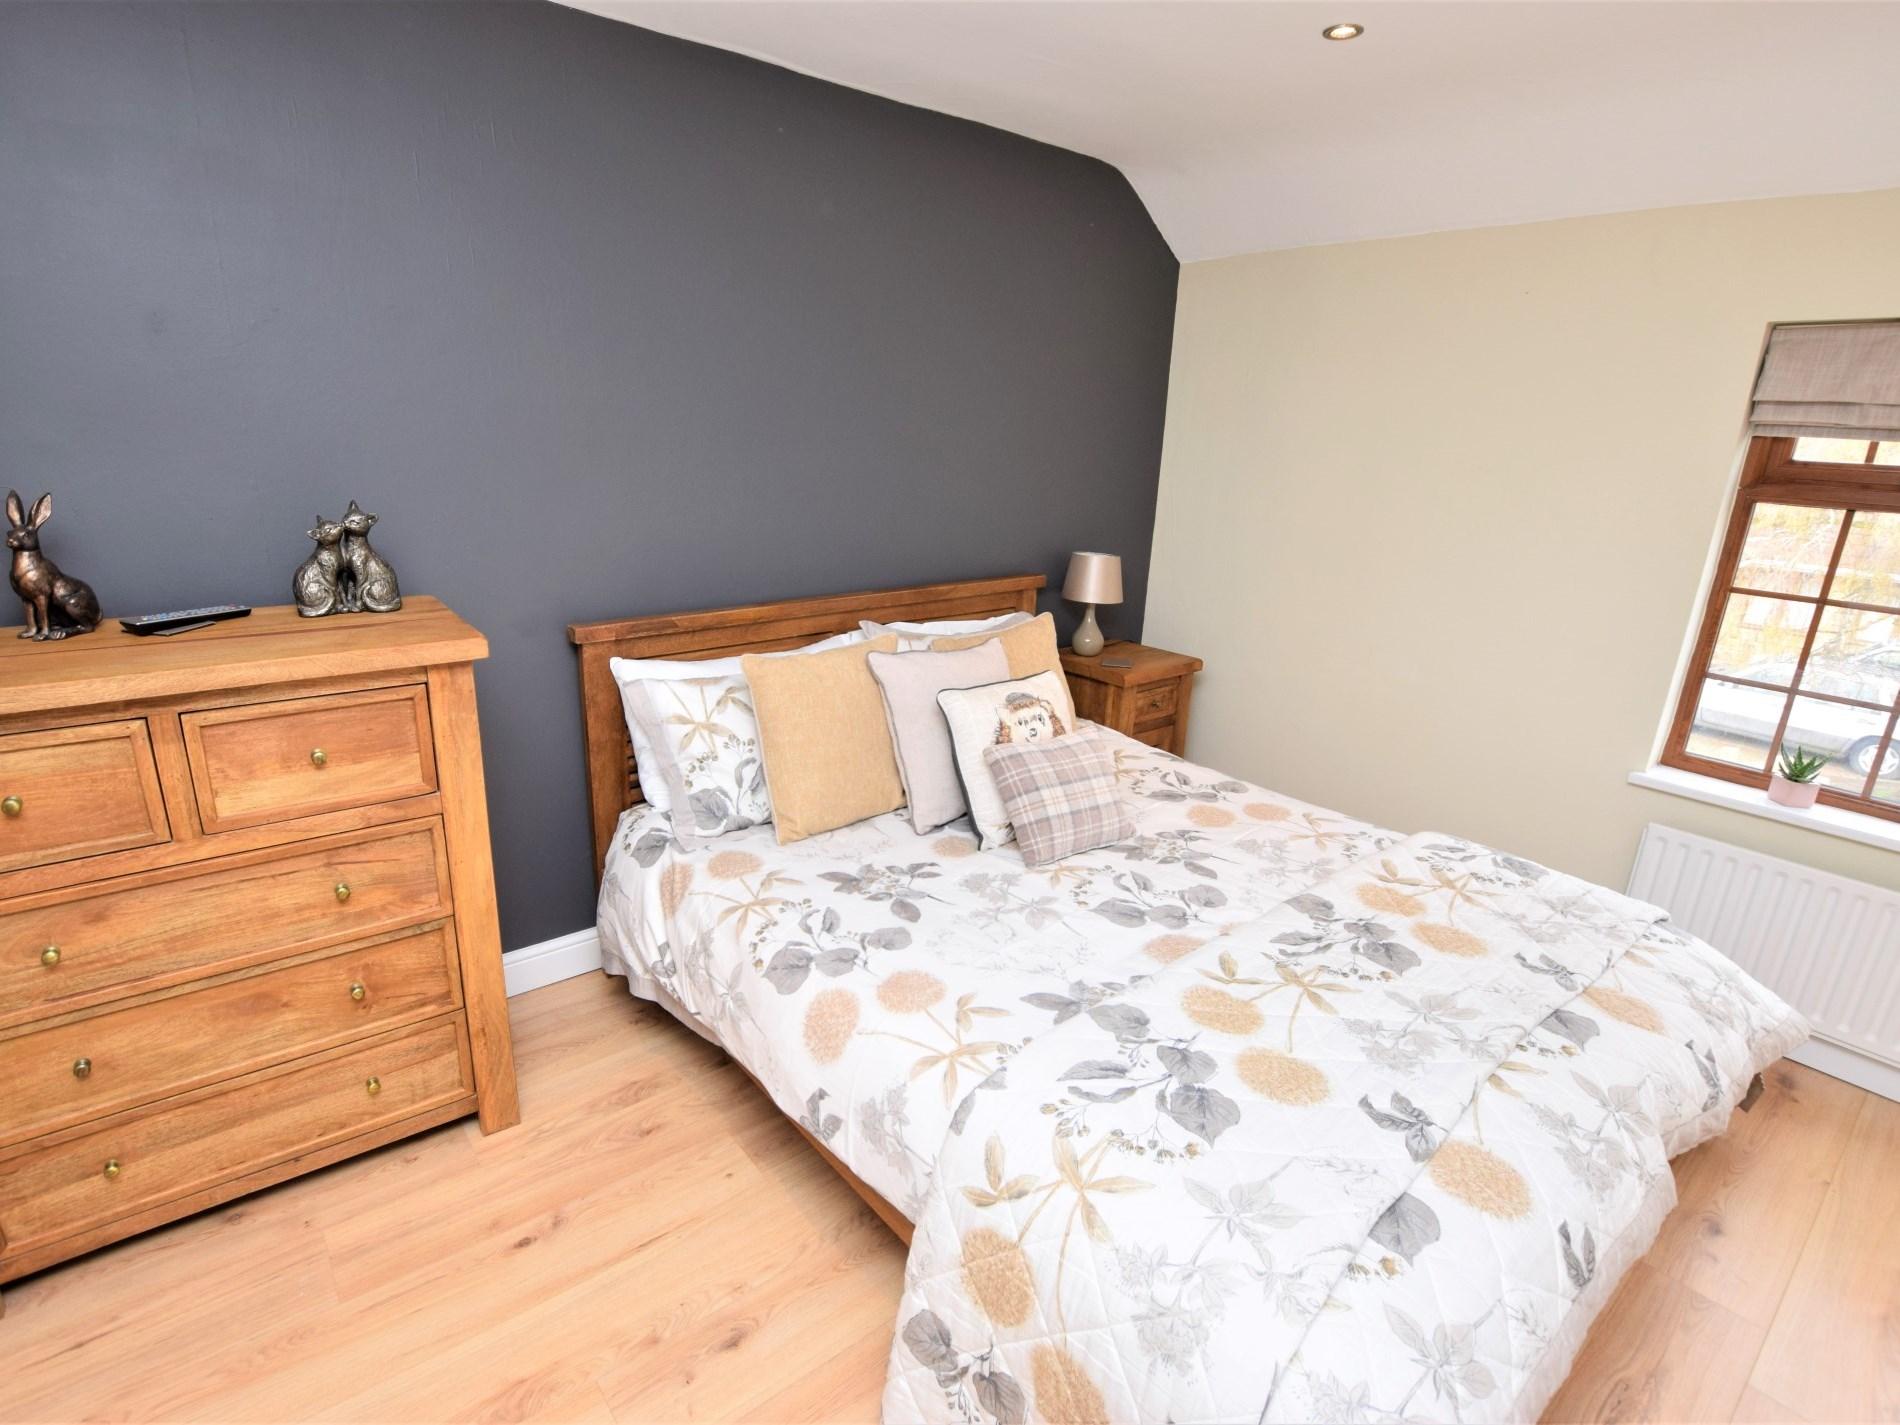 2 Bedroom Cottage in Dronfield, Peak District